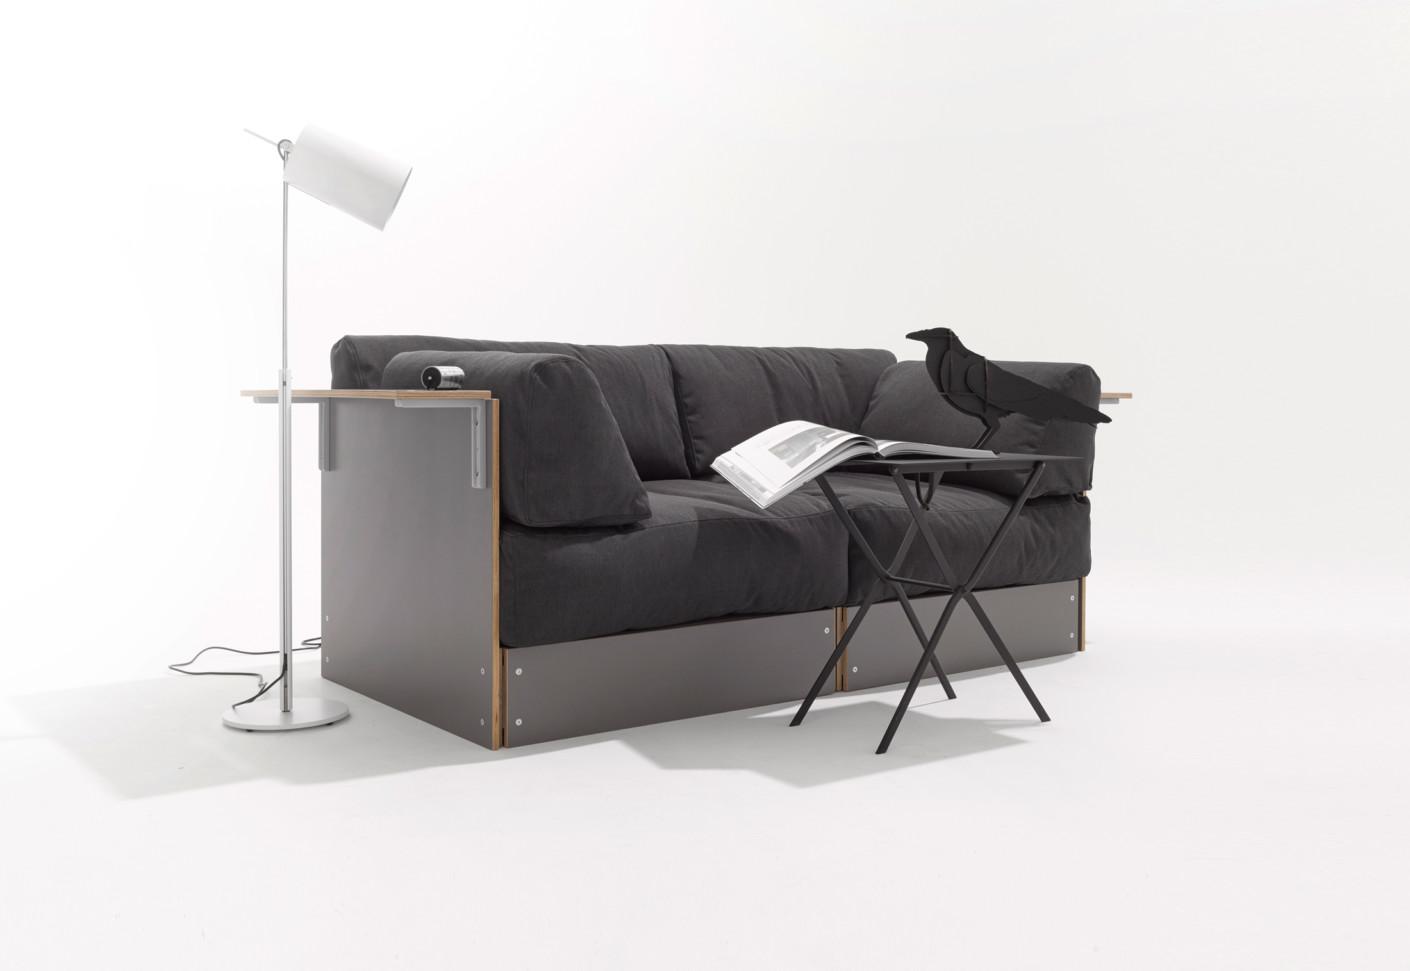 rolf heide sofabank von m ller m belwerkst tten stylepark. Black Bedroom Furniture Sets. Home Design Ideas